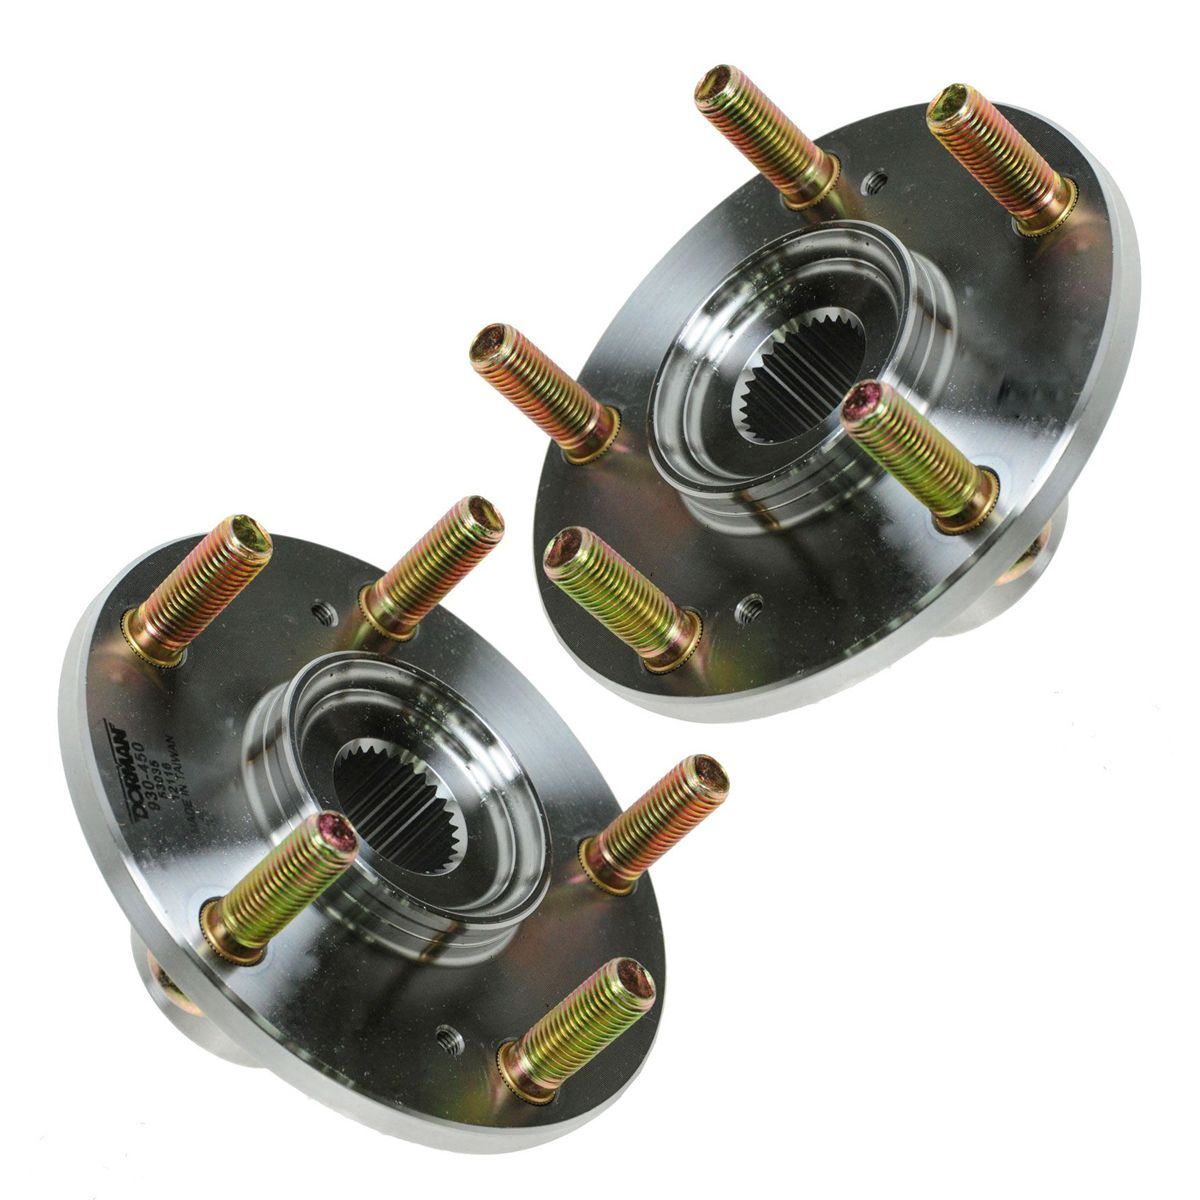 5 Lug Rear Wheel Hub Pair Set For Acura MDX Honda Pilot